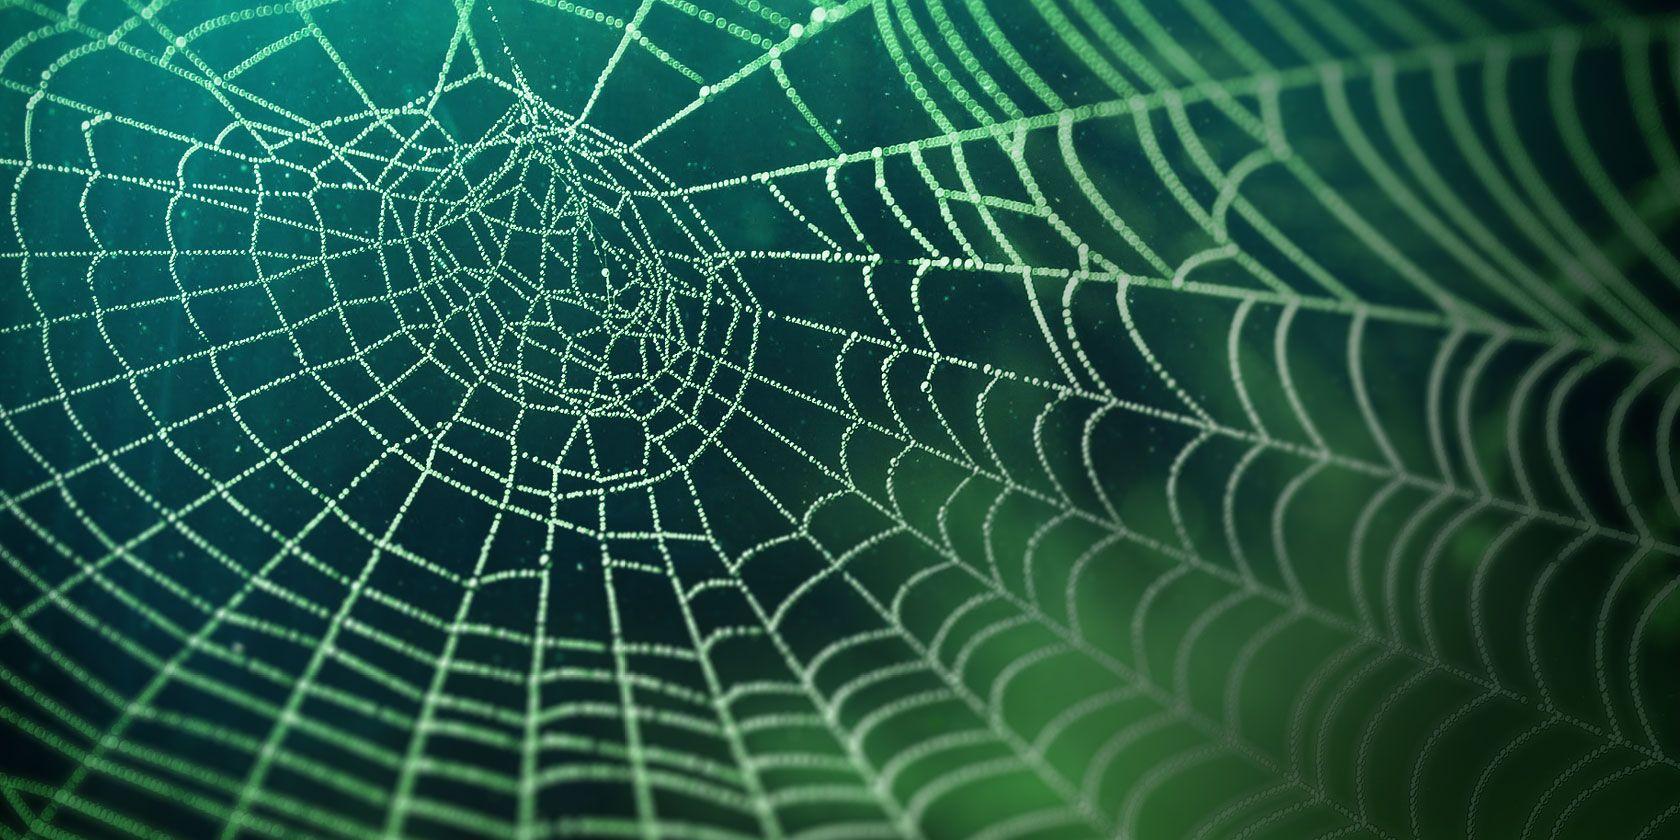 6 Dark Web Myths Debunked: The Truths Behind Them